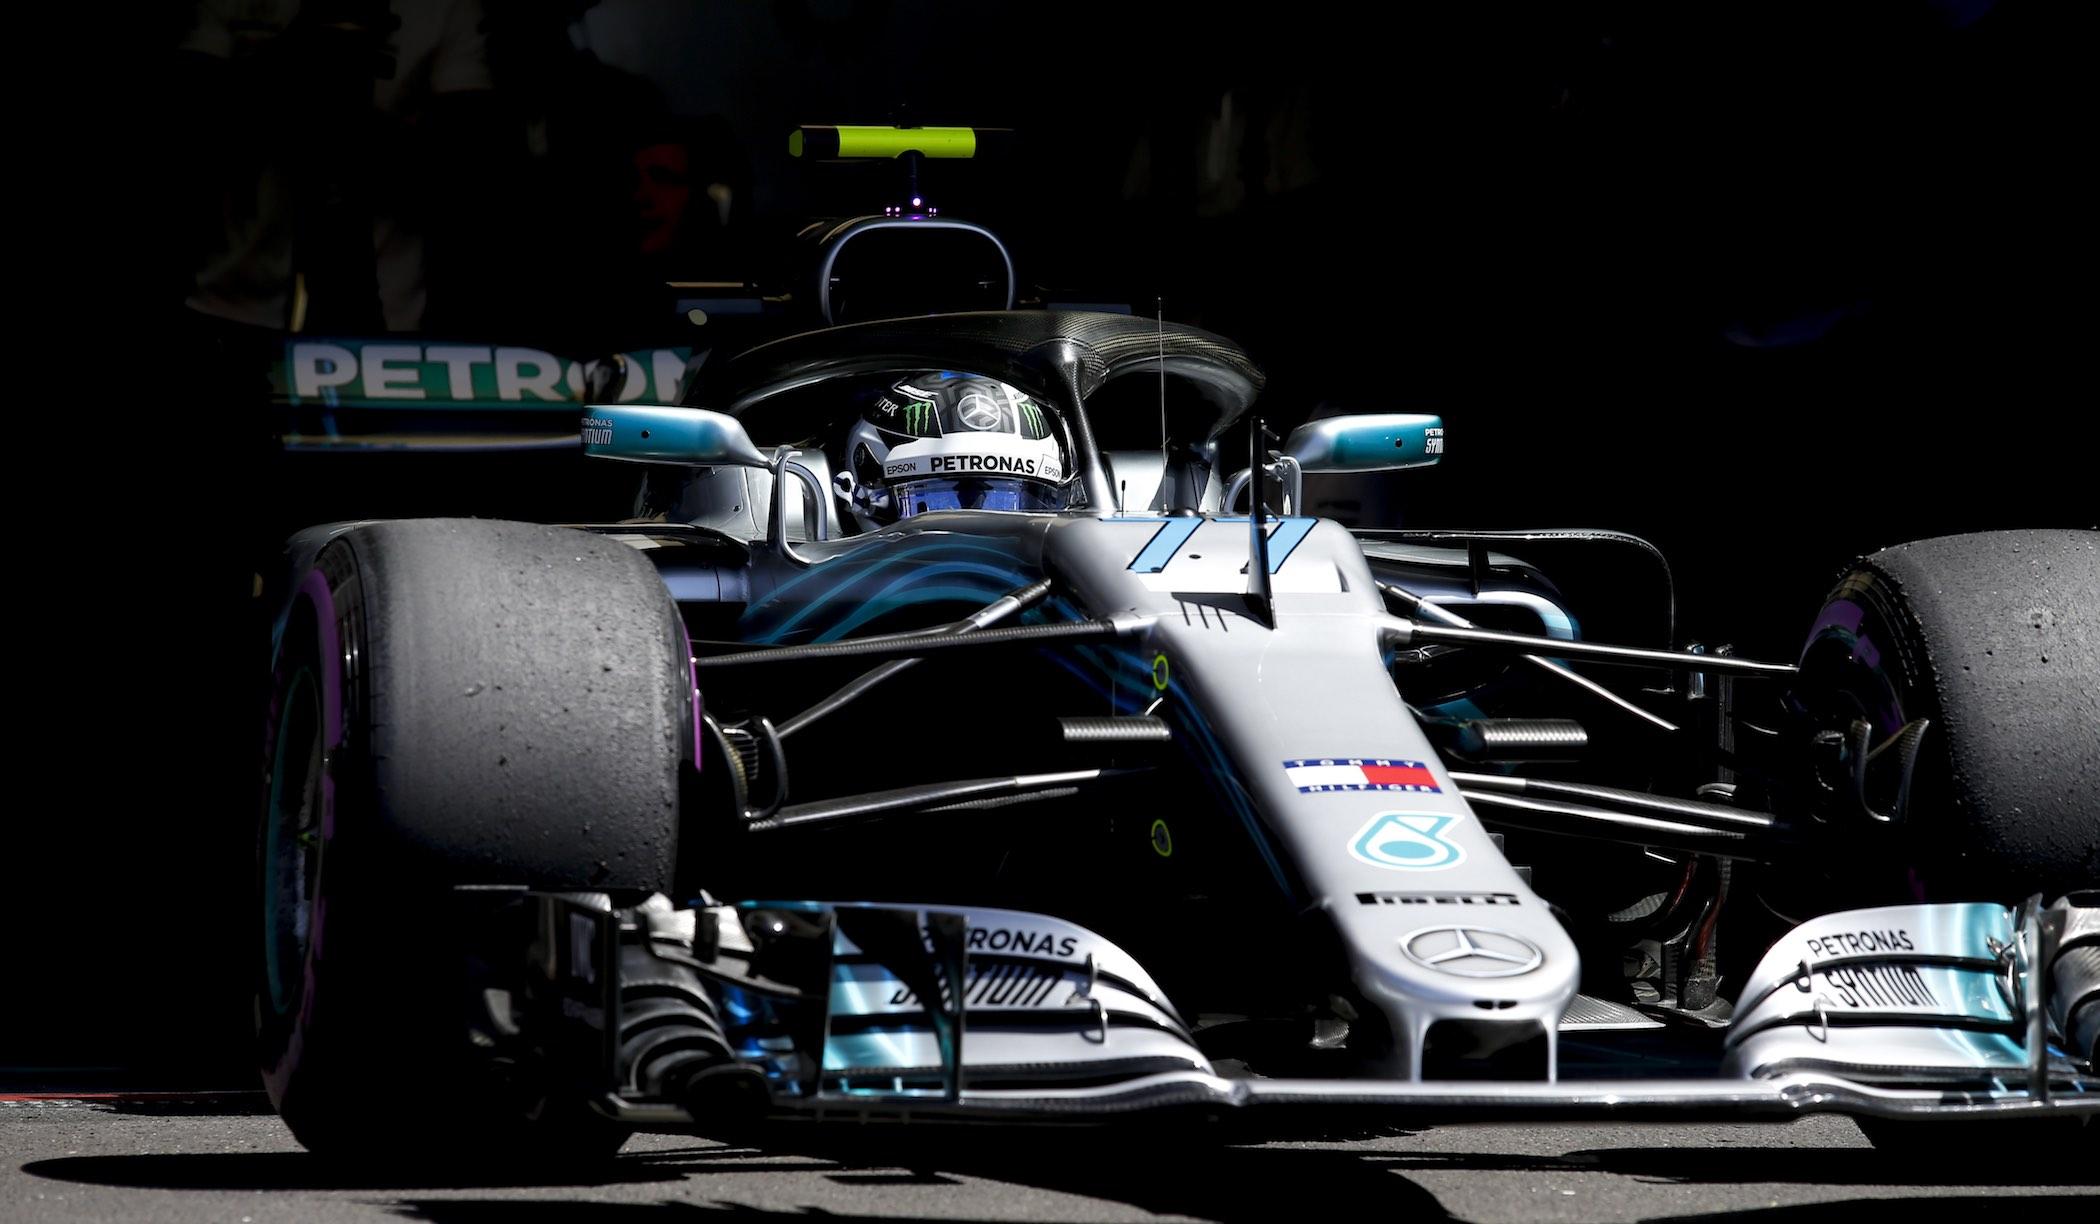 2018 French Grand Prix, Friday - Wolfgang Wilhelm